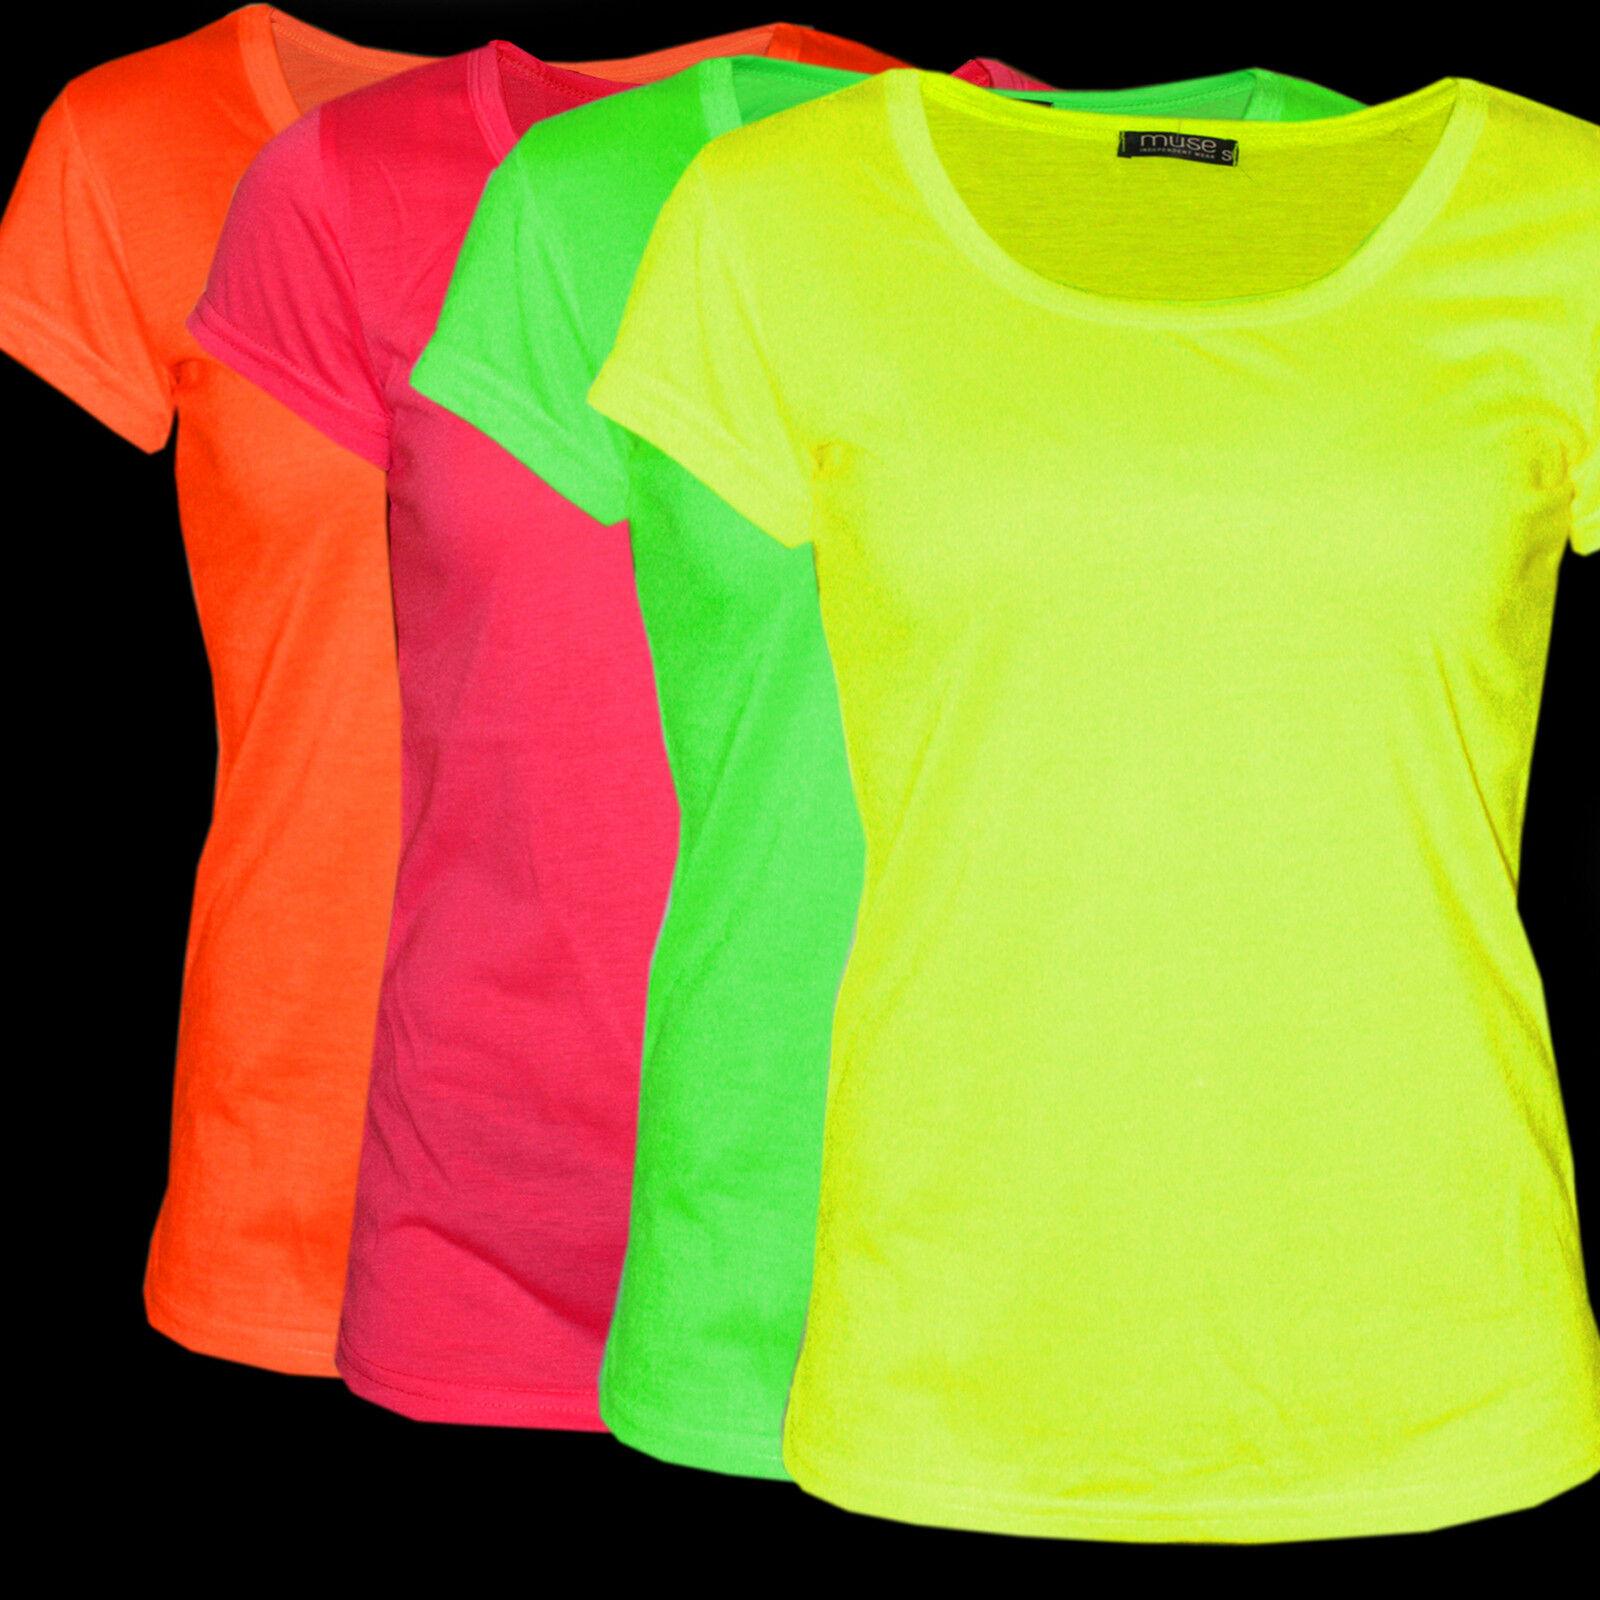 4491a08d5e0b2b Pinkes Tshirt Damen Test Vergleich +++ Pinkes Tshirt Damen kaufen ...